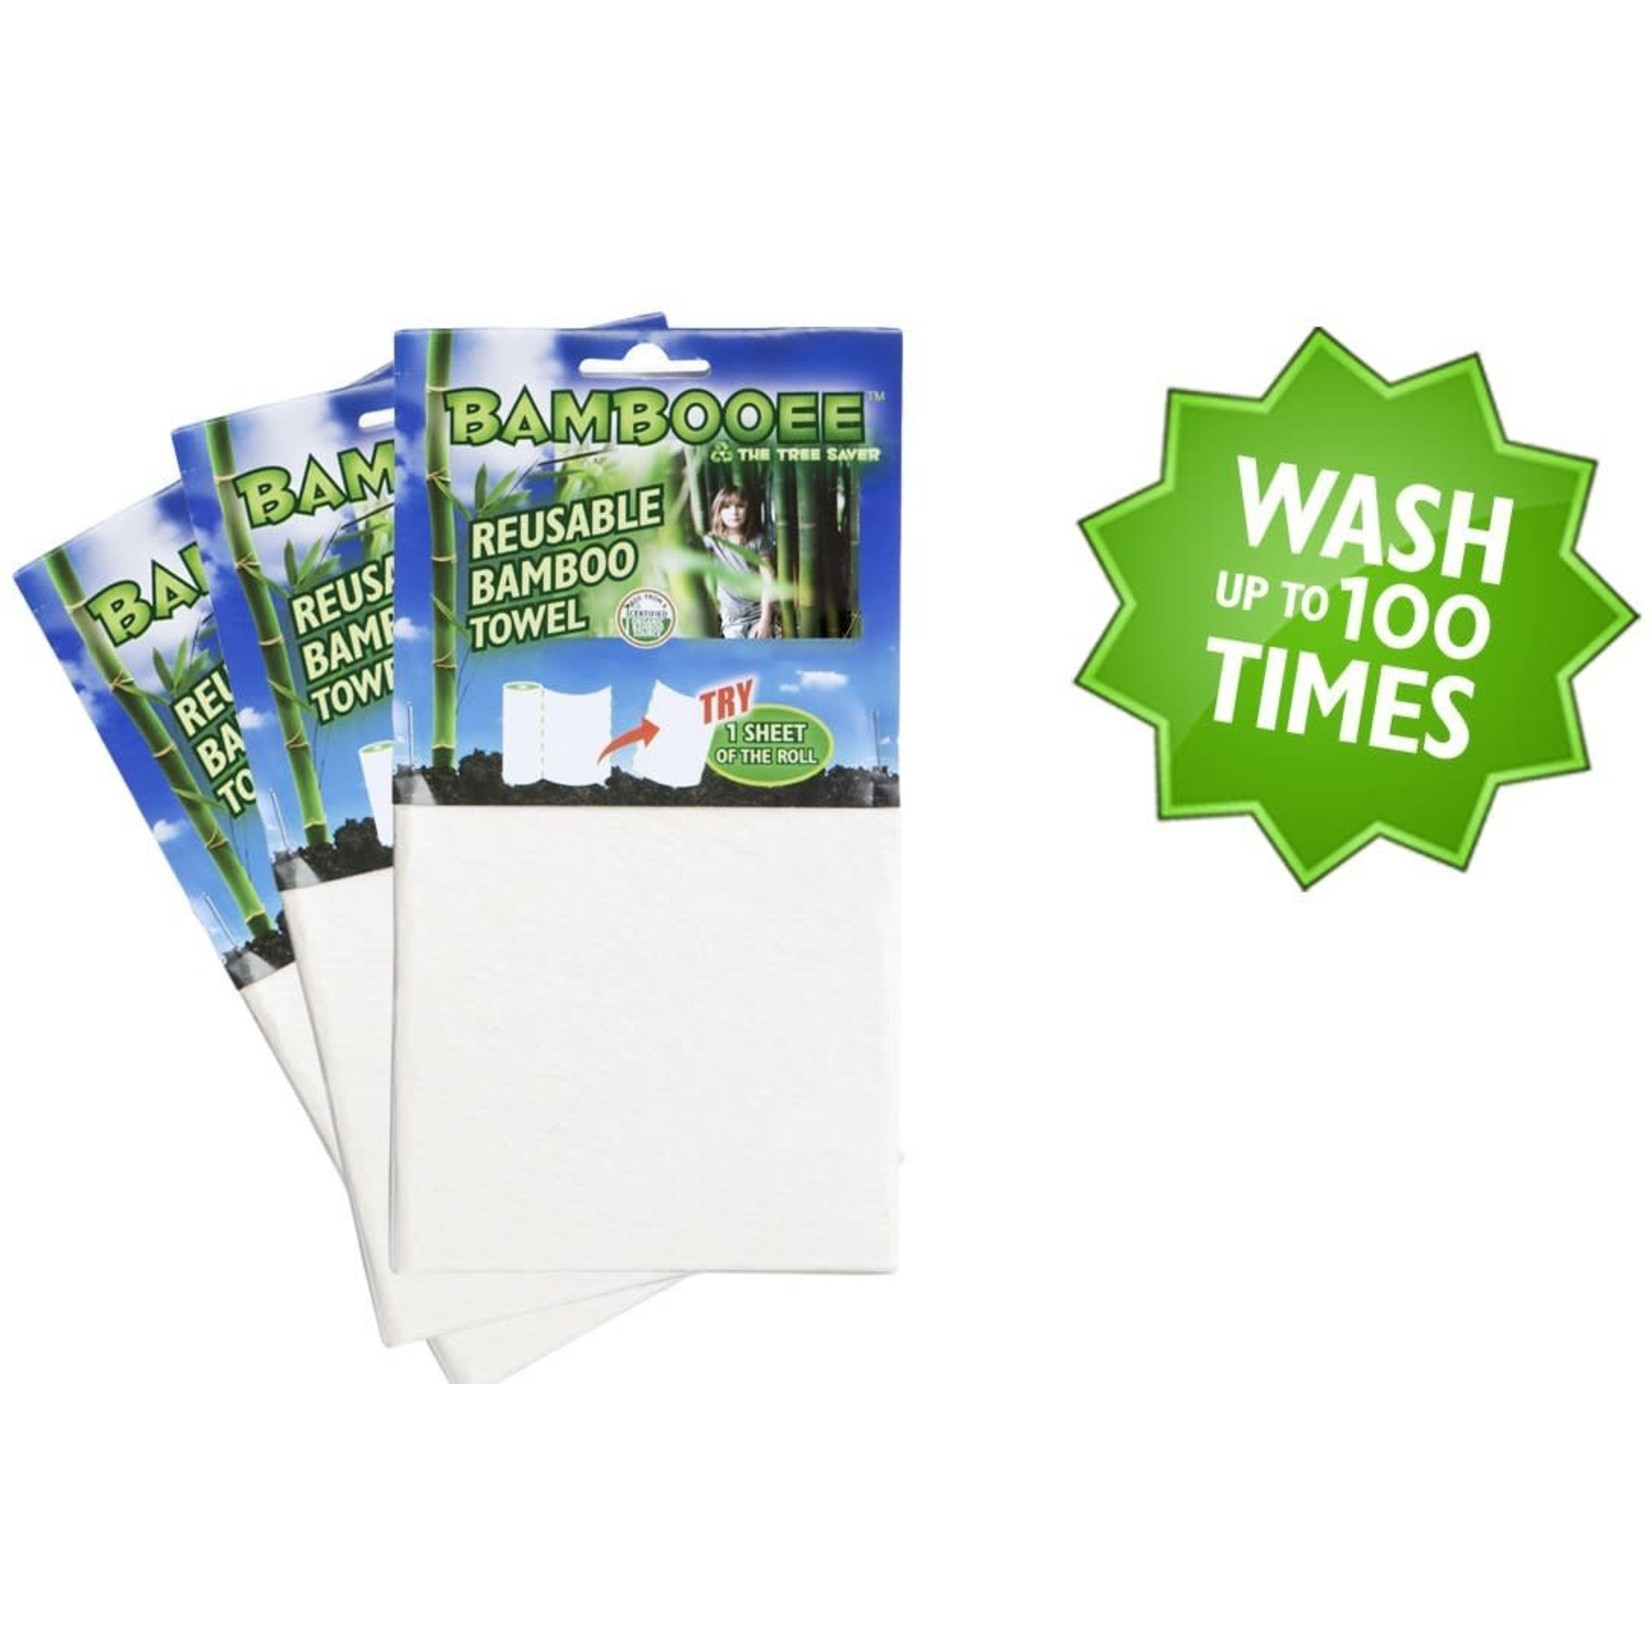 Bambooee Bambooee Reusable Towel Single